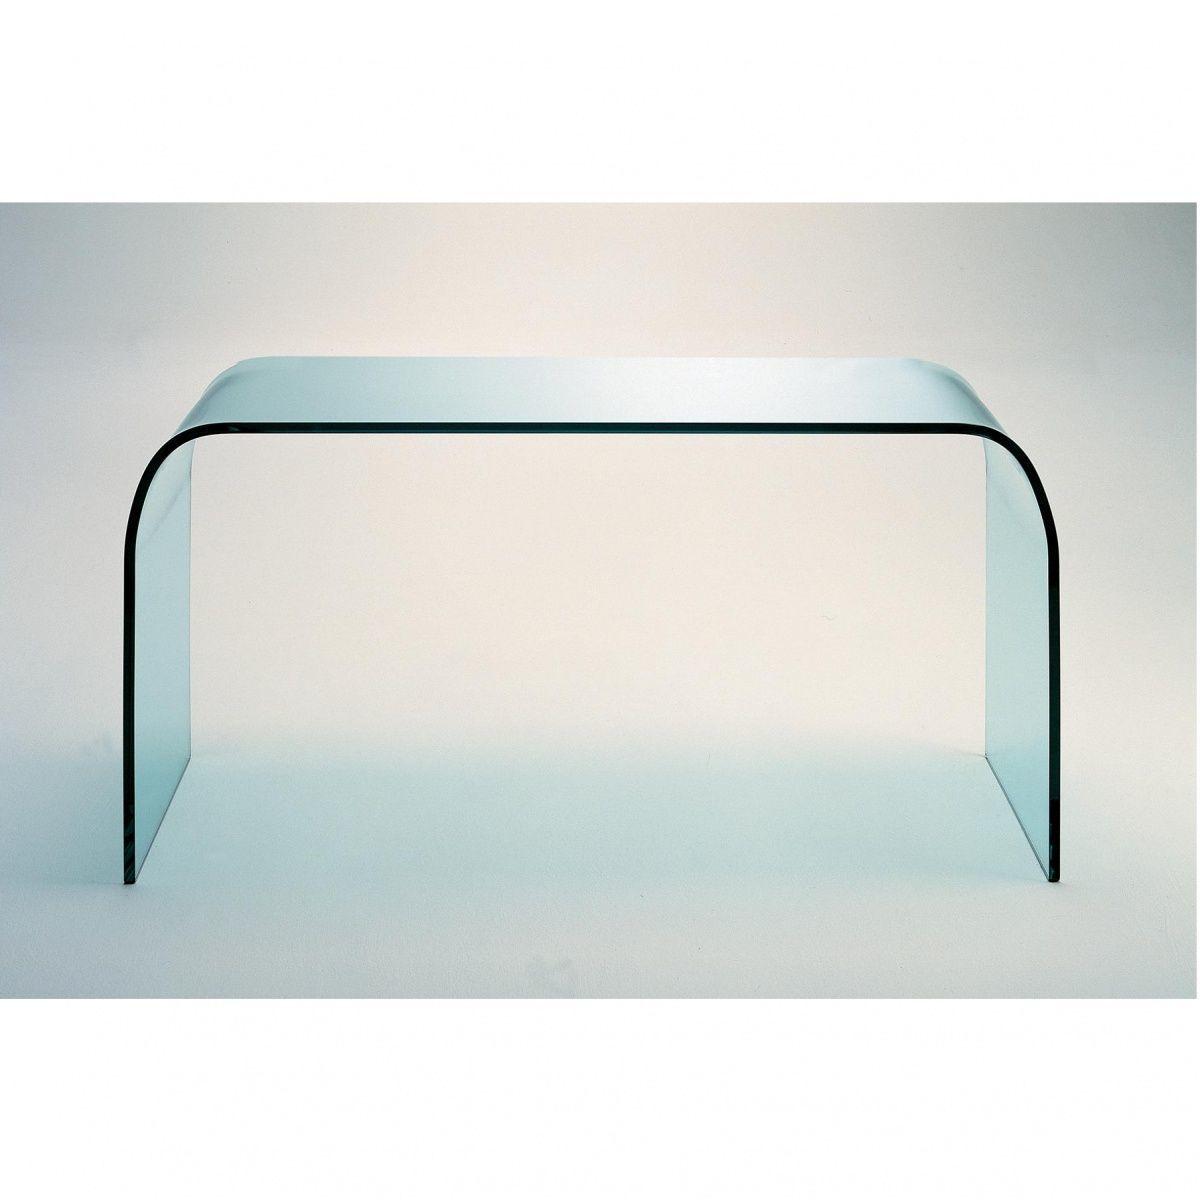 Fontana table coffee table fontana arte for Glas tische